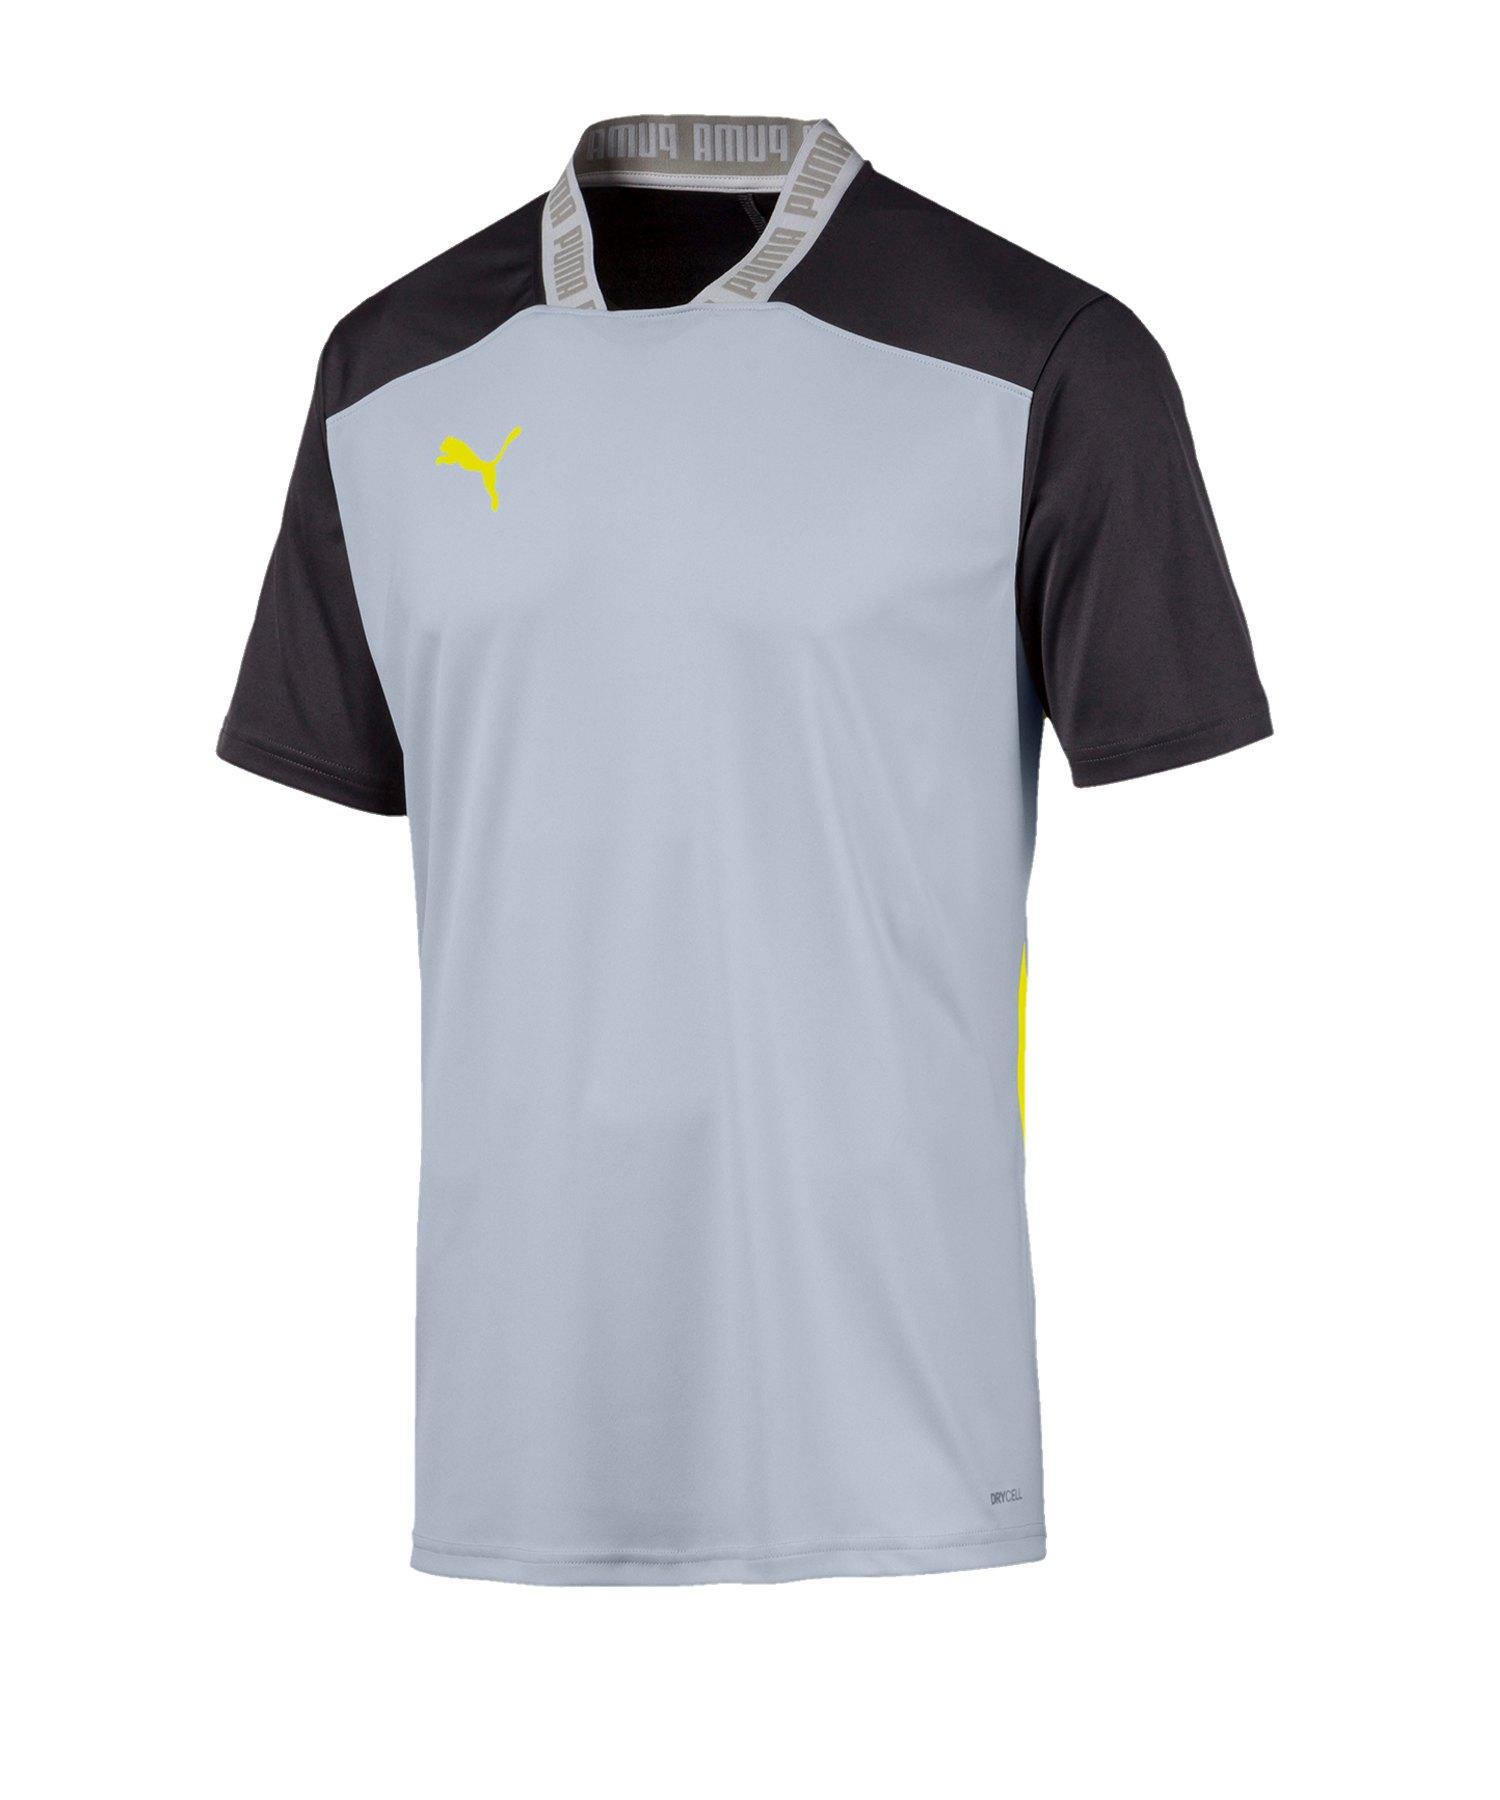 PUMA ftblNXT Pro Polo T-Shirt Grau Schwarz F002 - grau